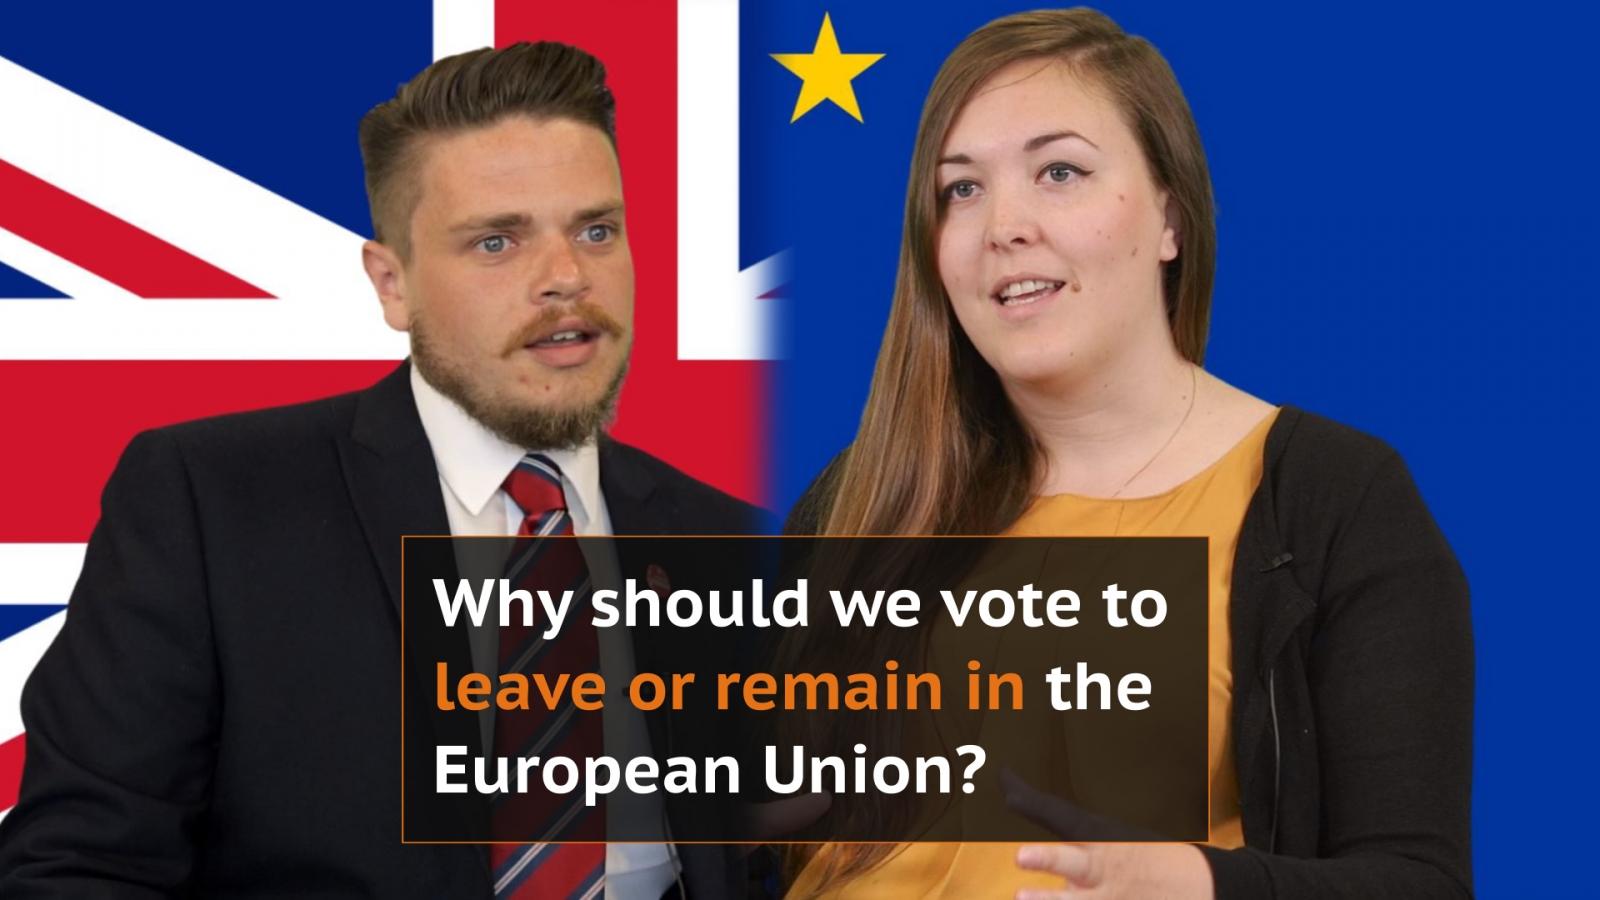 EU Referendum in a nutshell